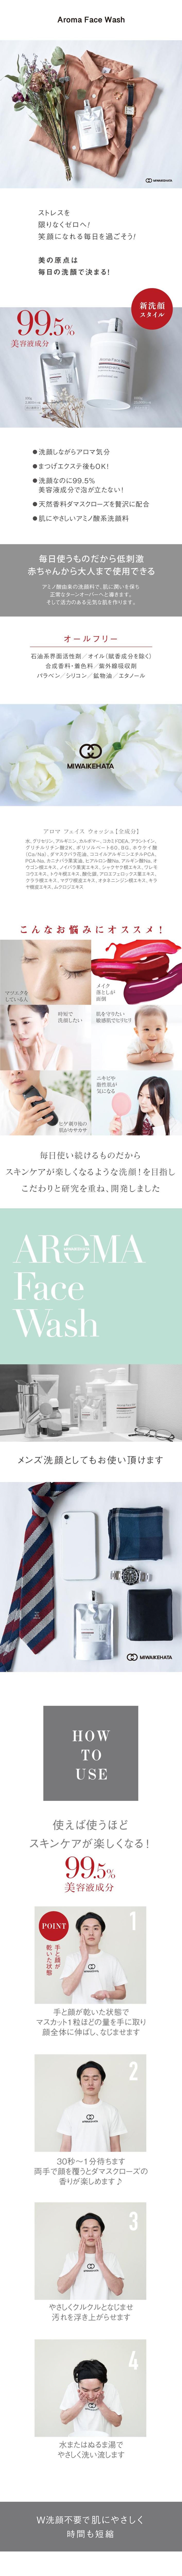 aroma_face_wash_web